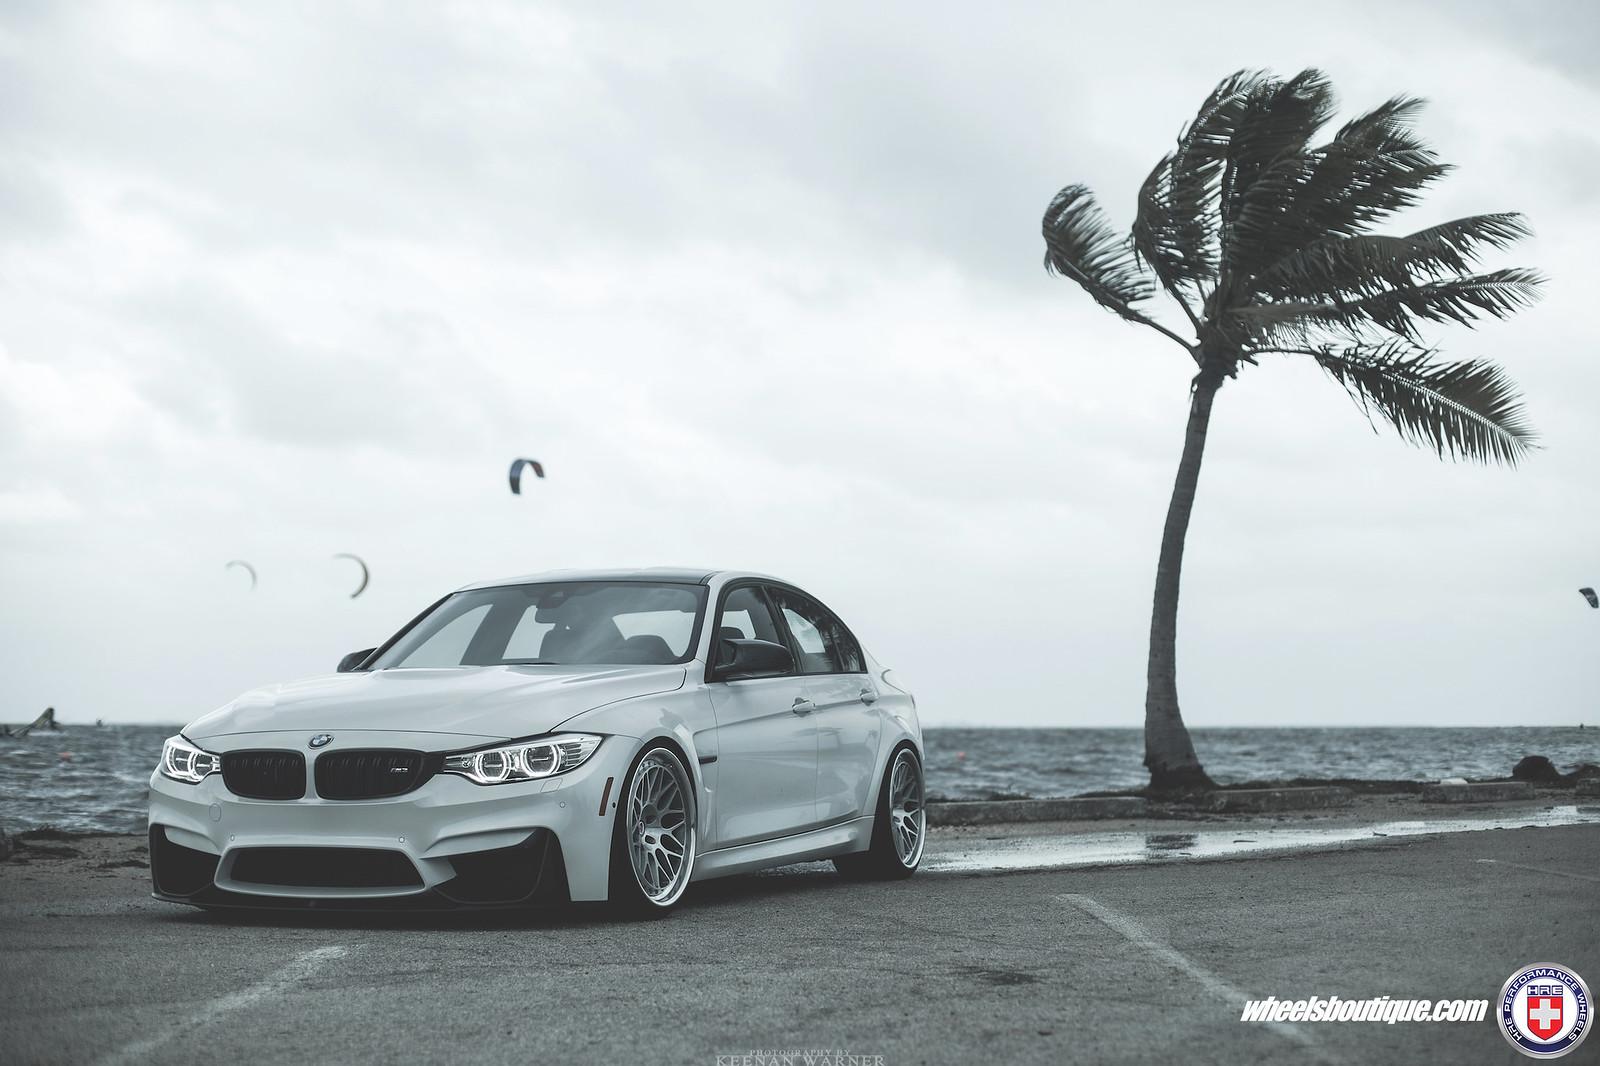 Pirelli Nero >> Wheels Boutique – BMW F80 M3 x HRE Classic 300